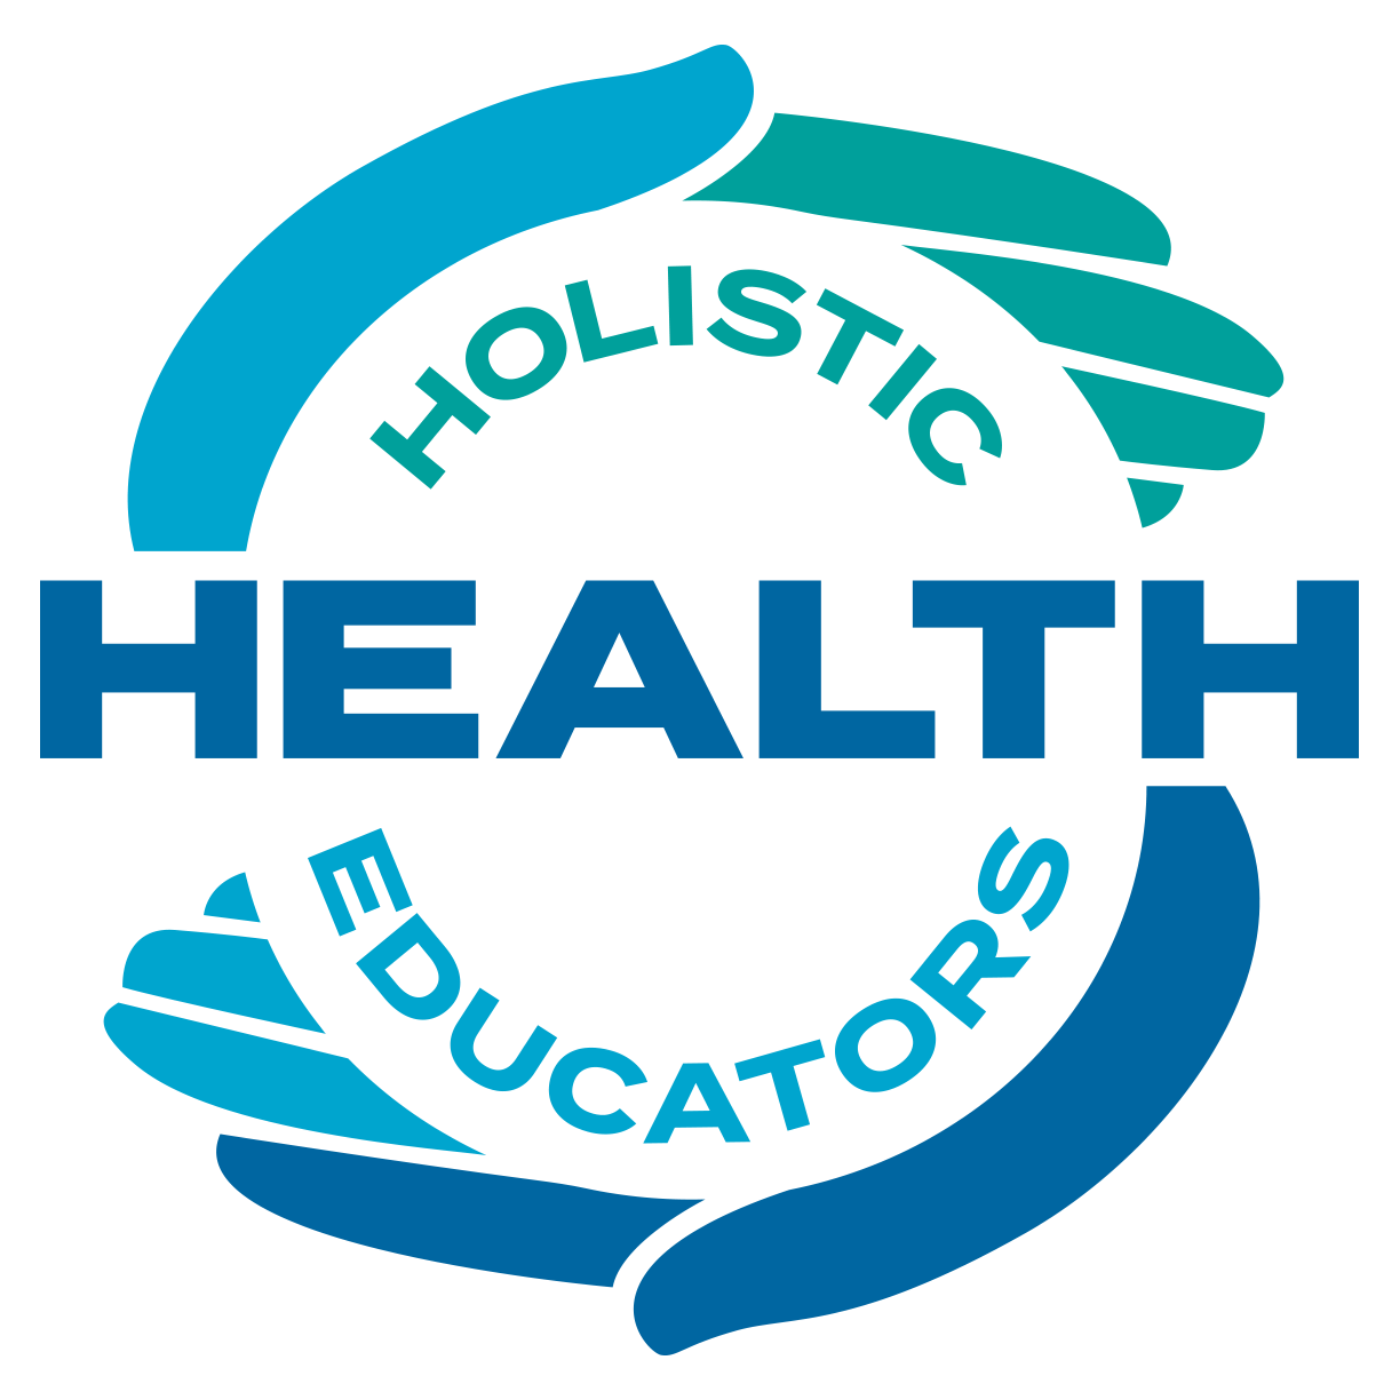 Holisitic Health Educators BODcast!